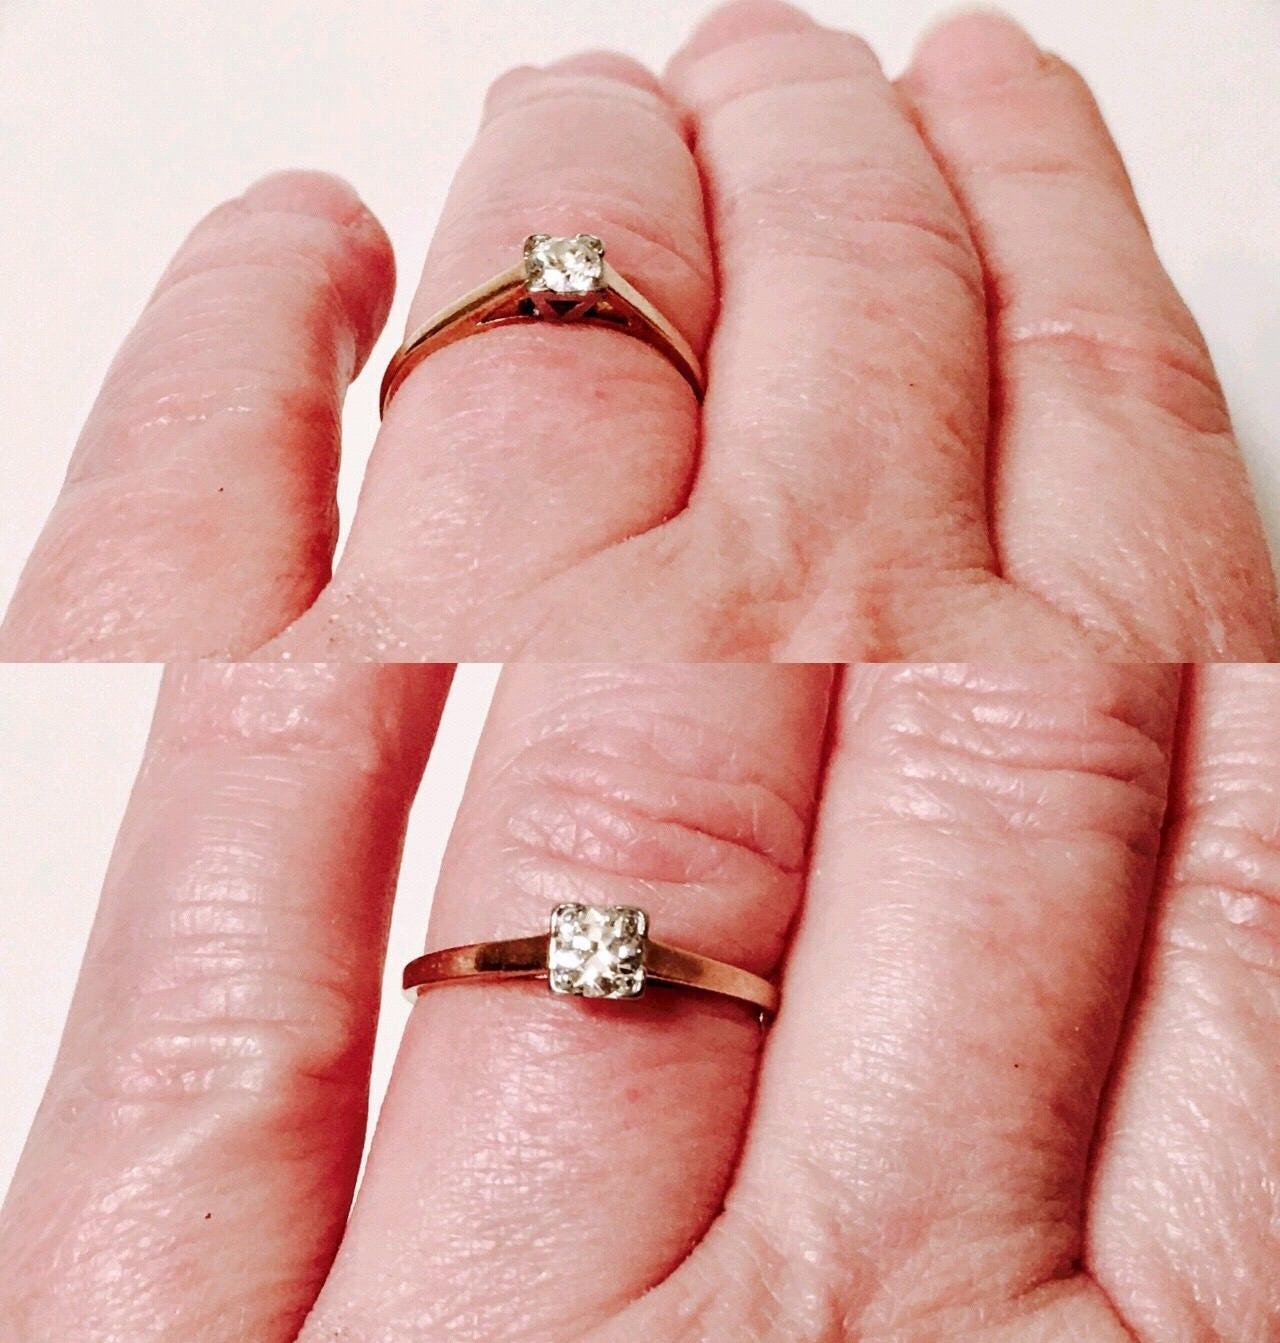 Vintage 585 14k Gold 1/4 Carat Diamond Solitaire Engagement Ring ...